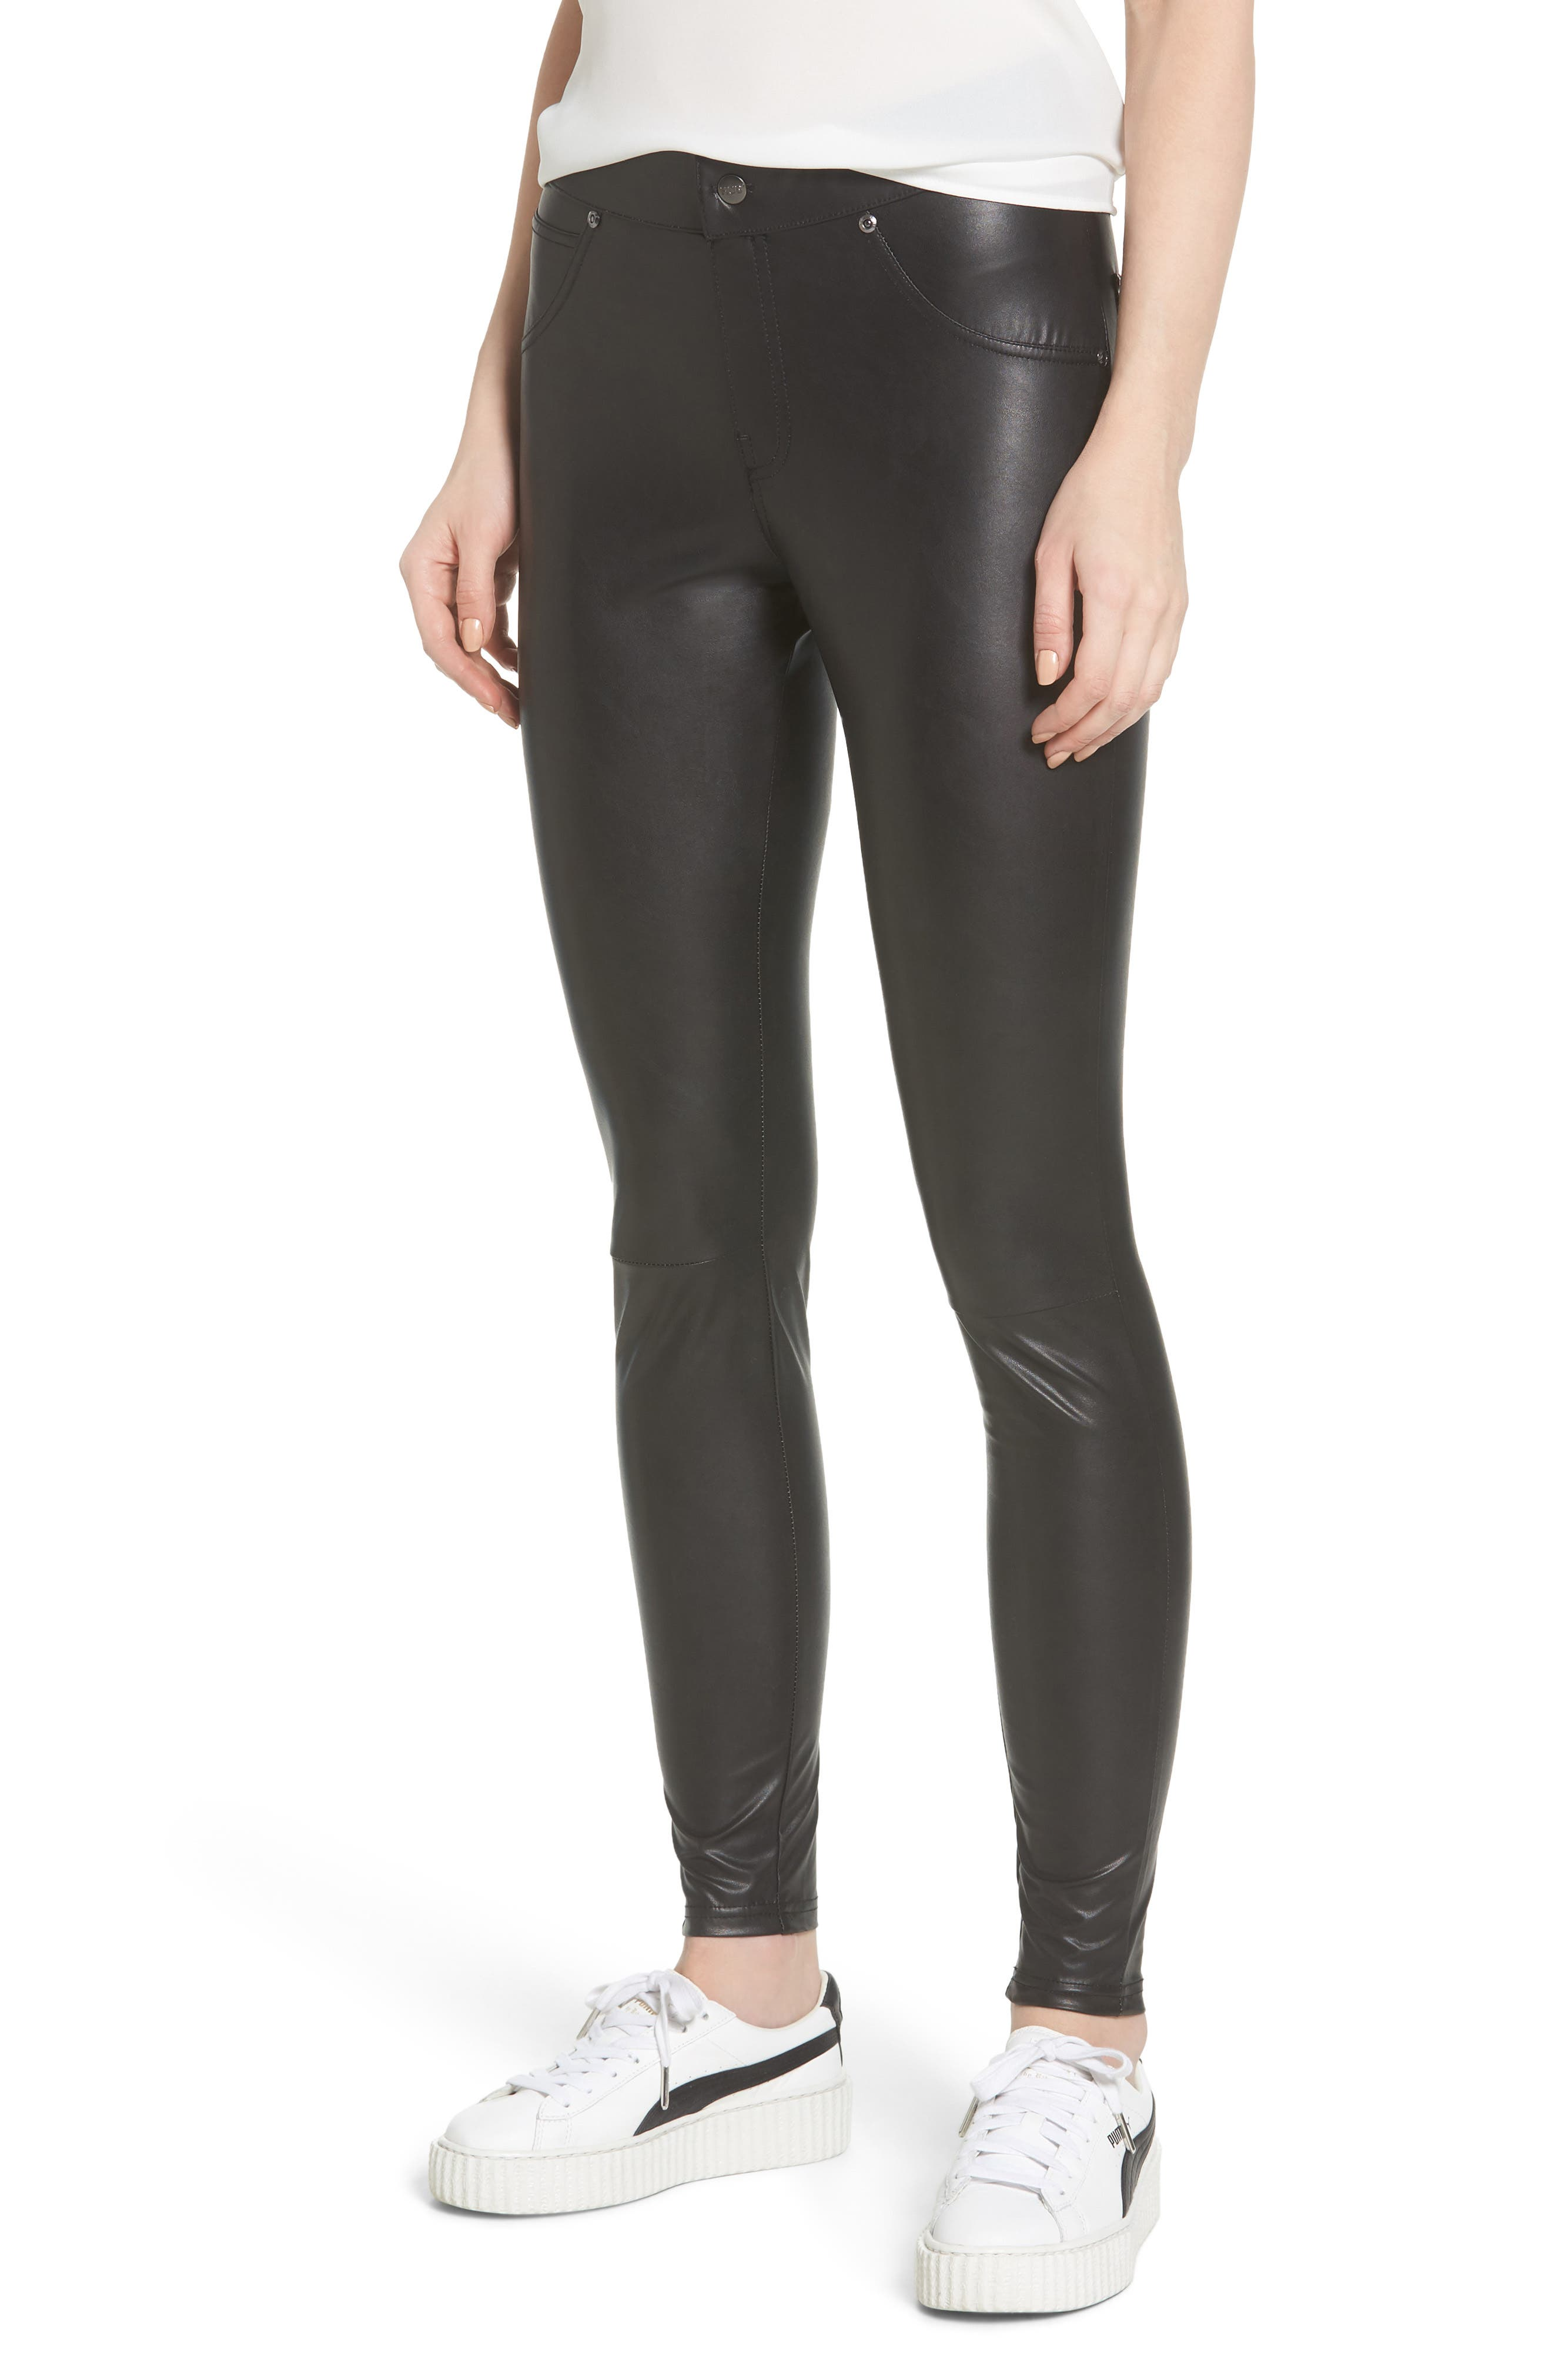 Main Image - Hue Leatherette Curvy Leggings